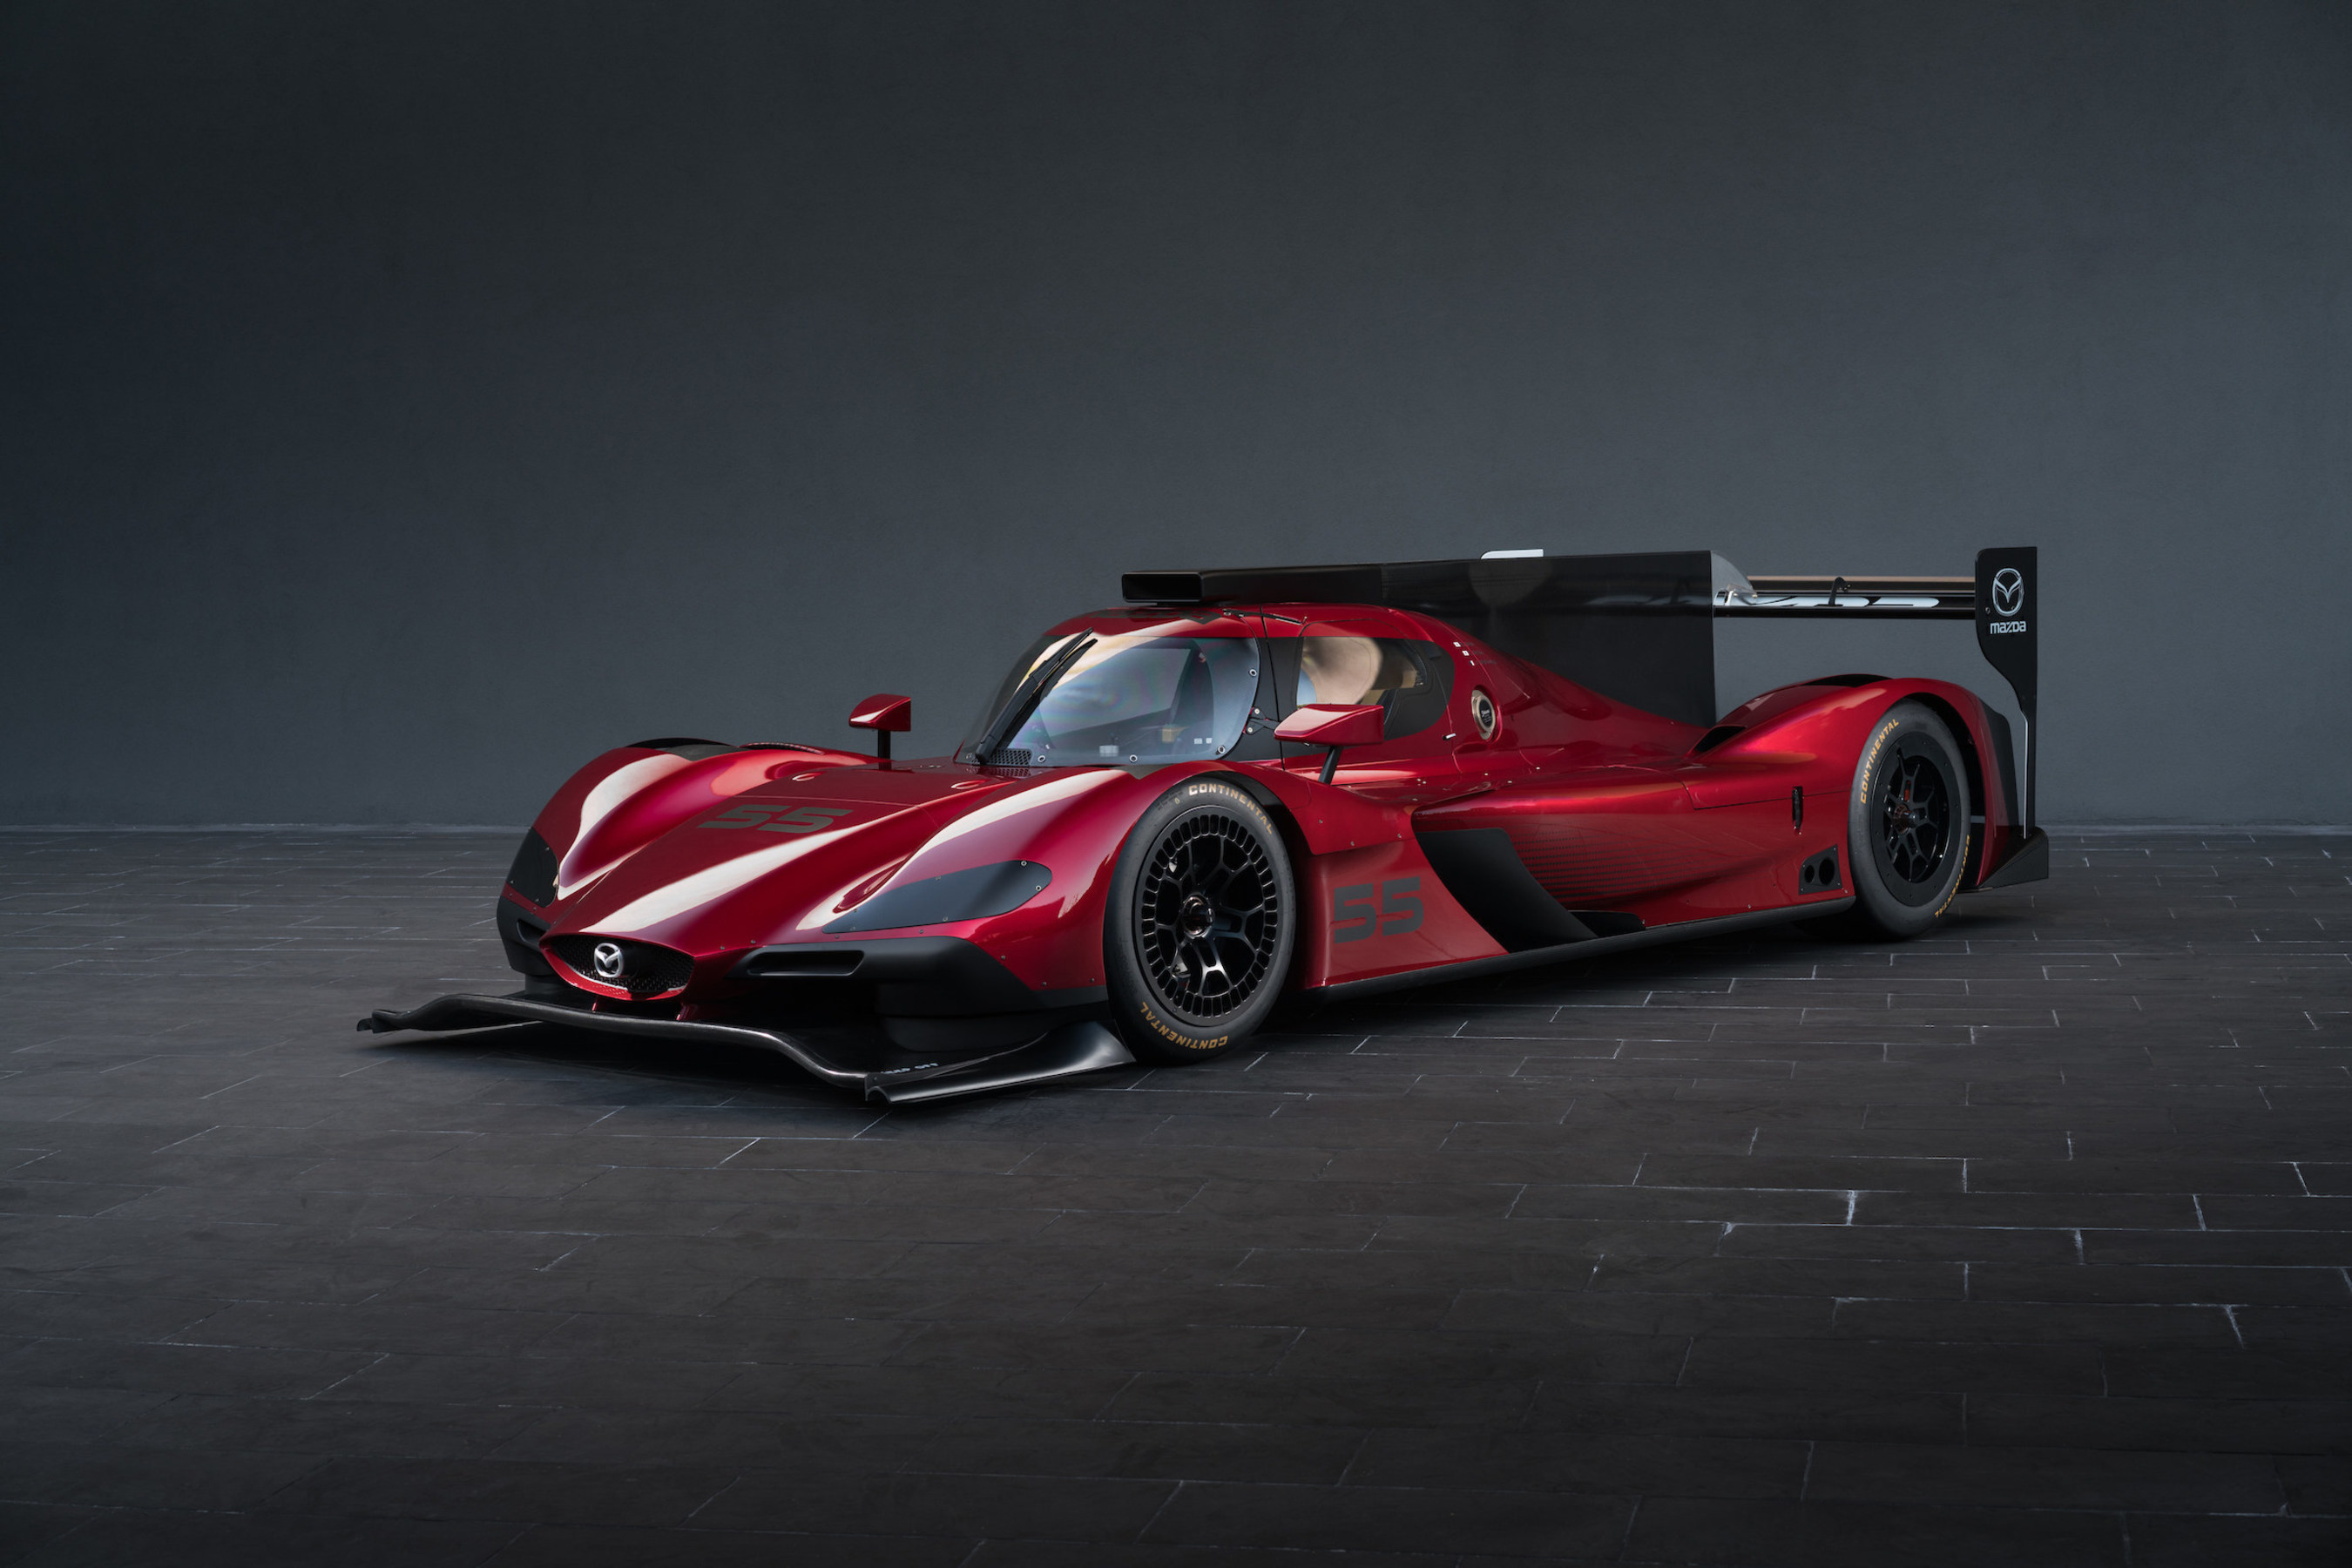 Mazda Unveils New Prototype Race Car at Los Angeles Auto Show